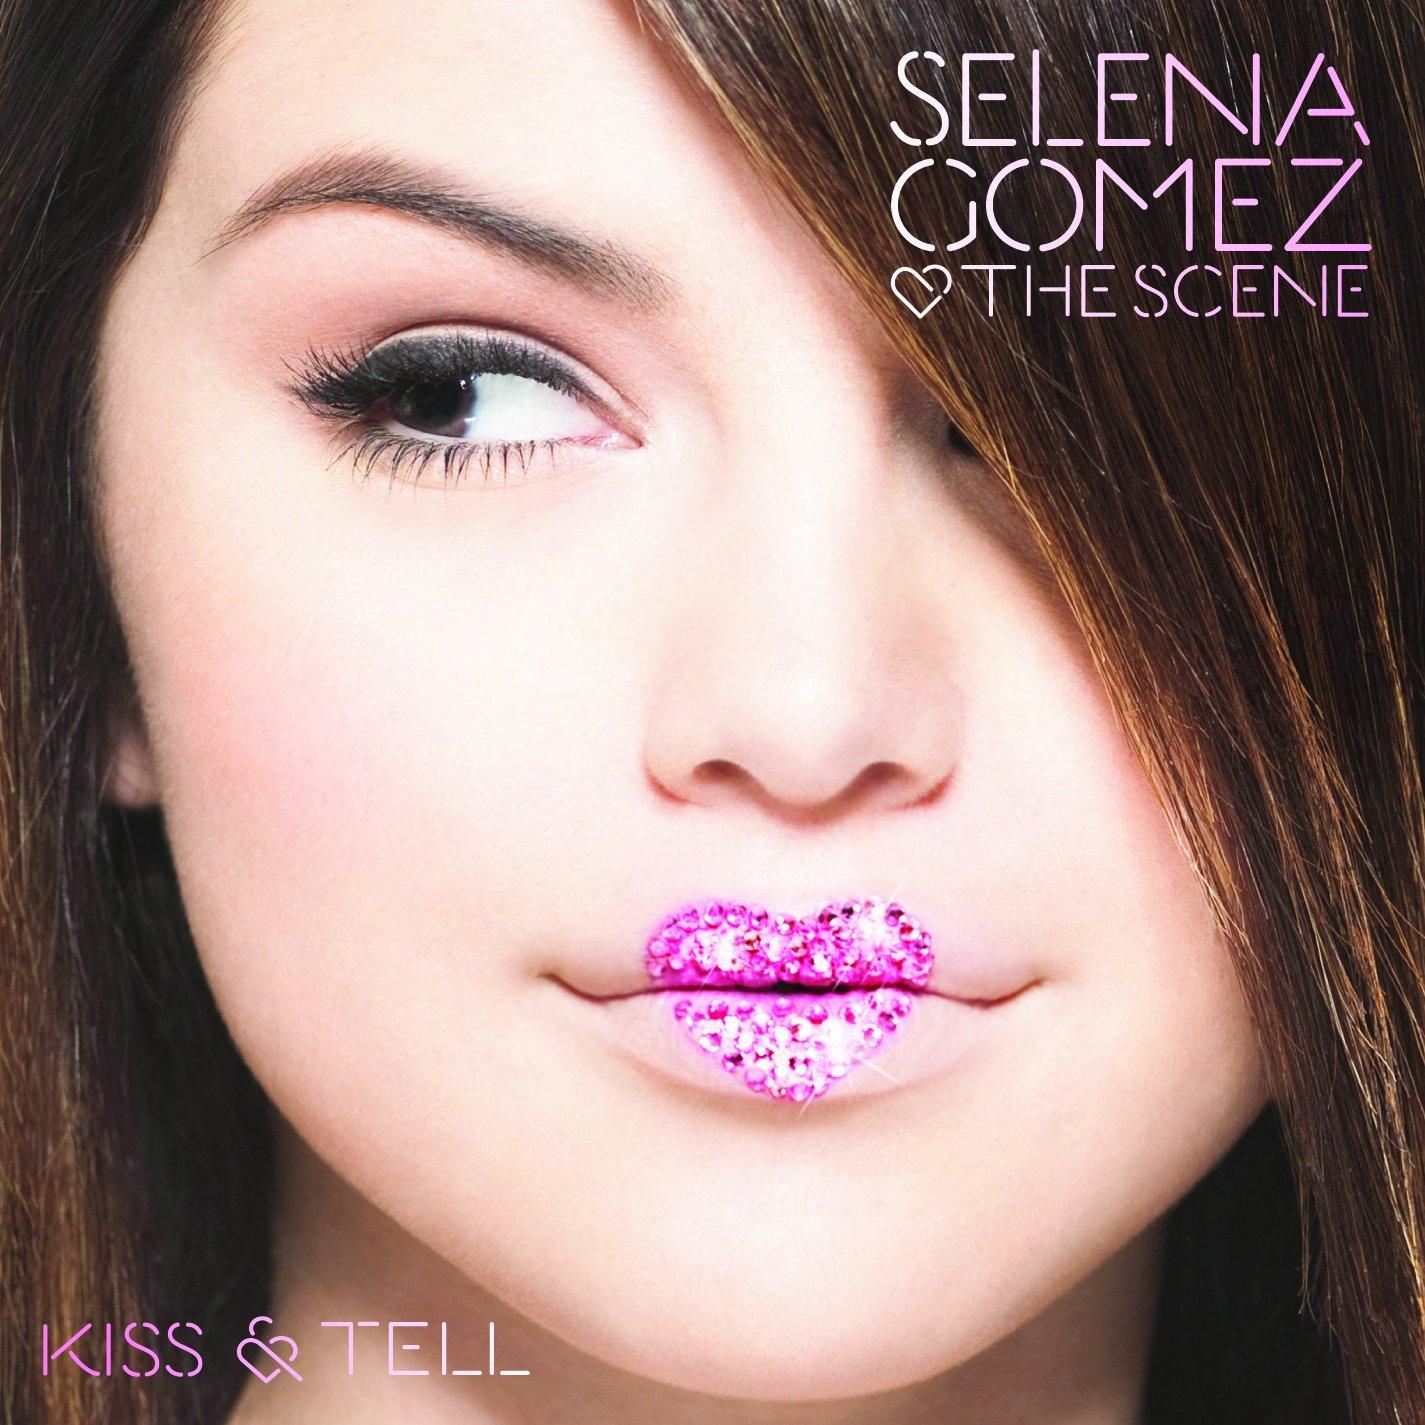 http://3.bp.blogspot.com/_lgTyldTrebU/TQq4iXI8YlI/AAAAAAAAAFs/A9D8q7E8e4w/s1600/Kiss+and+Tell+Album.jpg